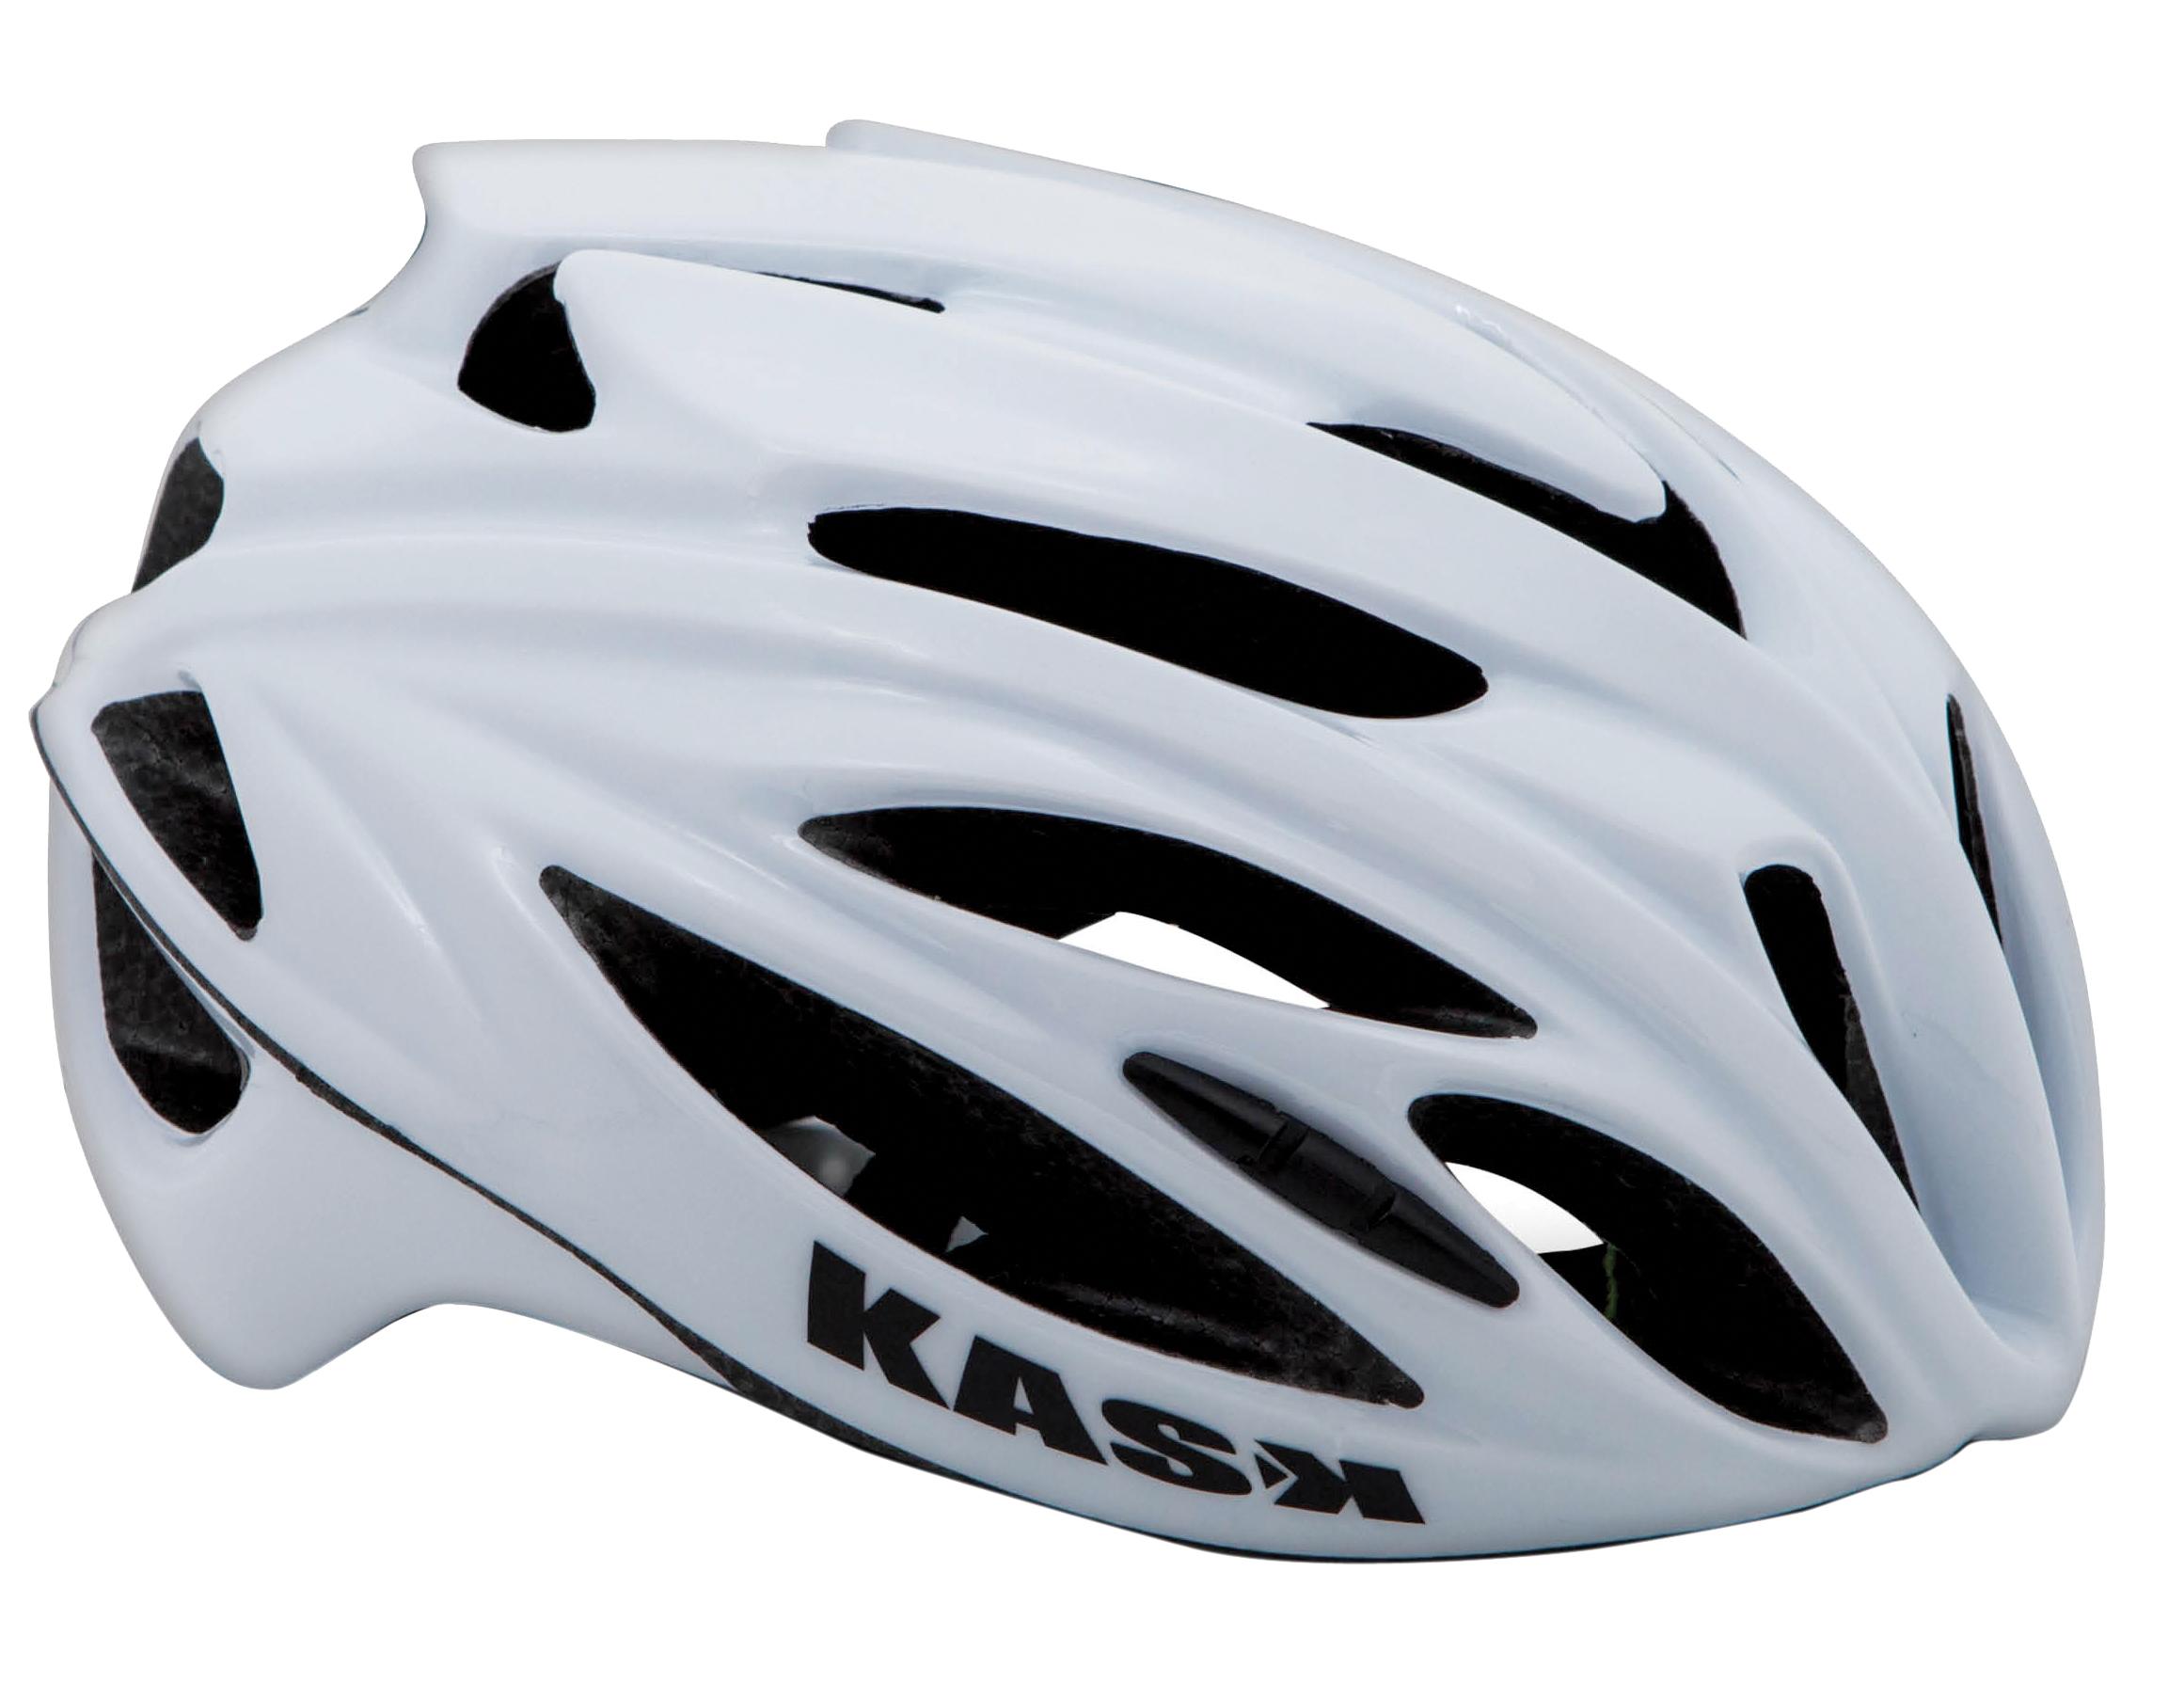 Kask Rapido Cycling Helmet - Unisex cb74ad66d